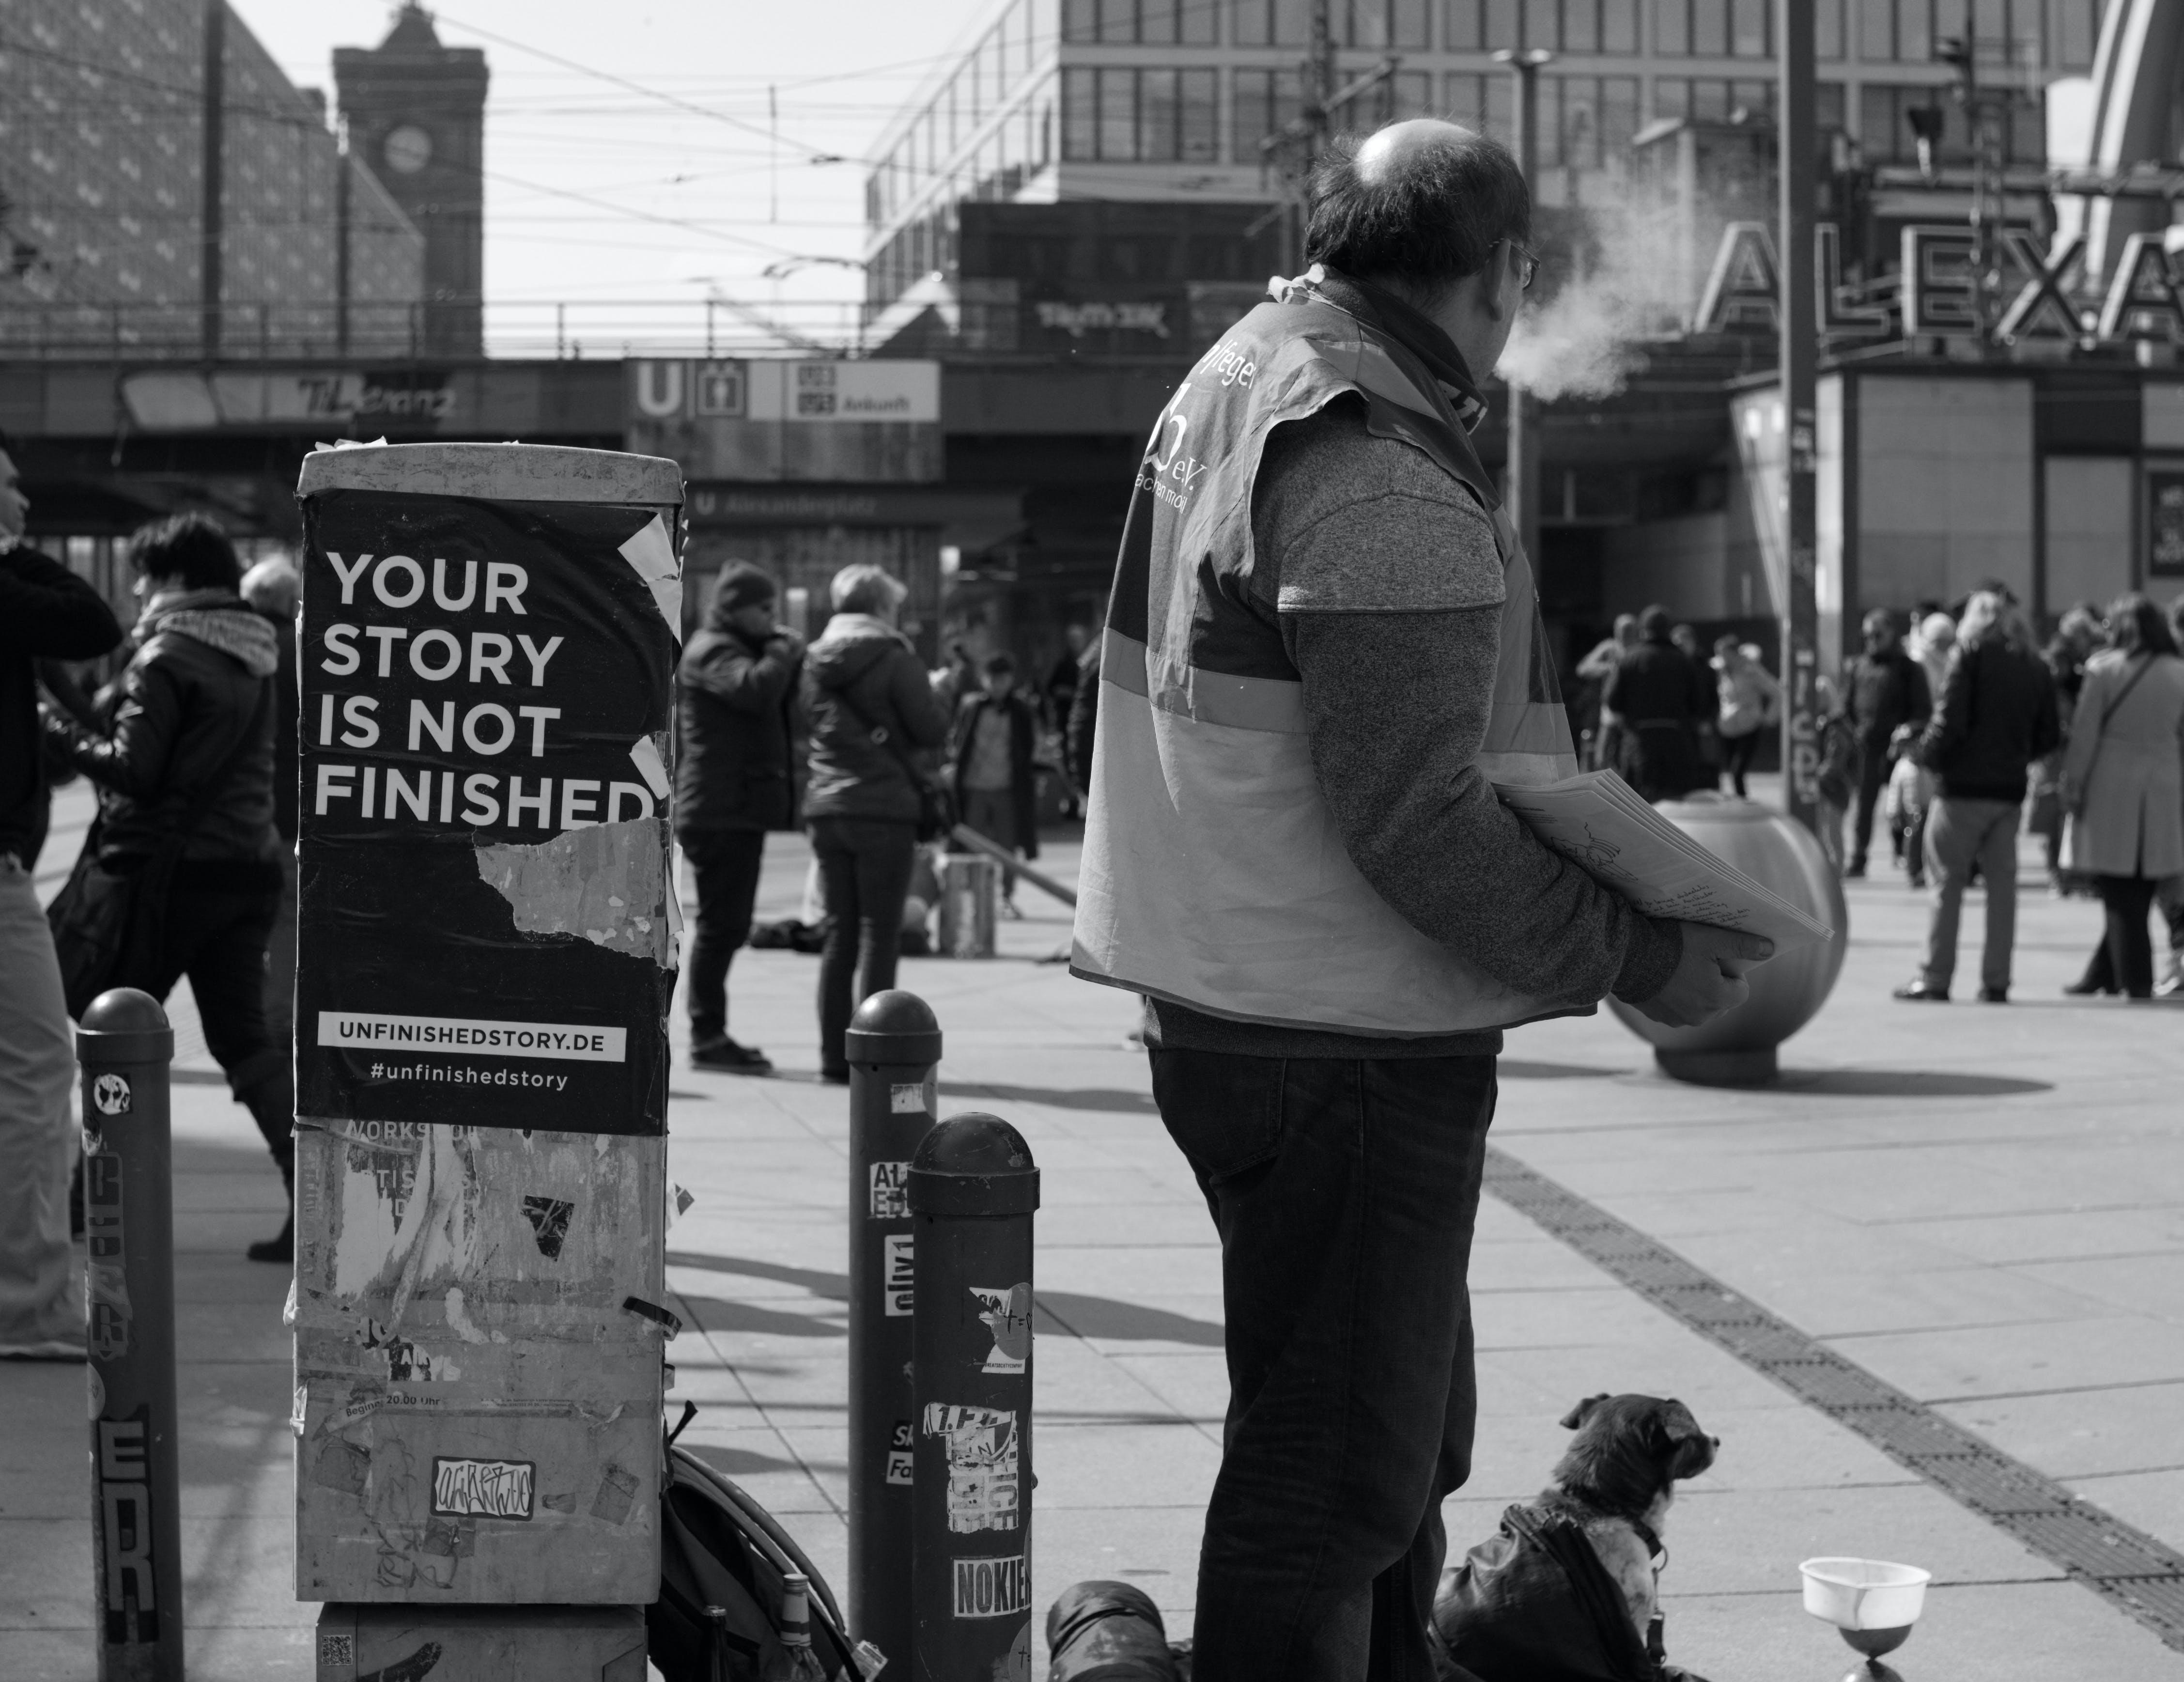 Free stock photo of Alexanderplatz, black and white, people, story